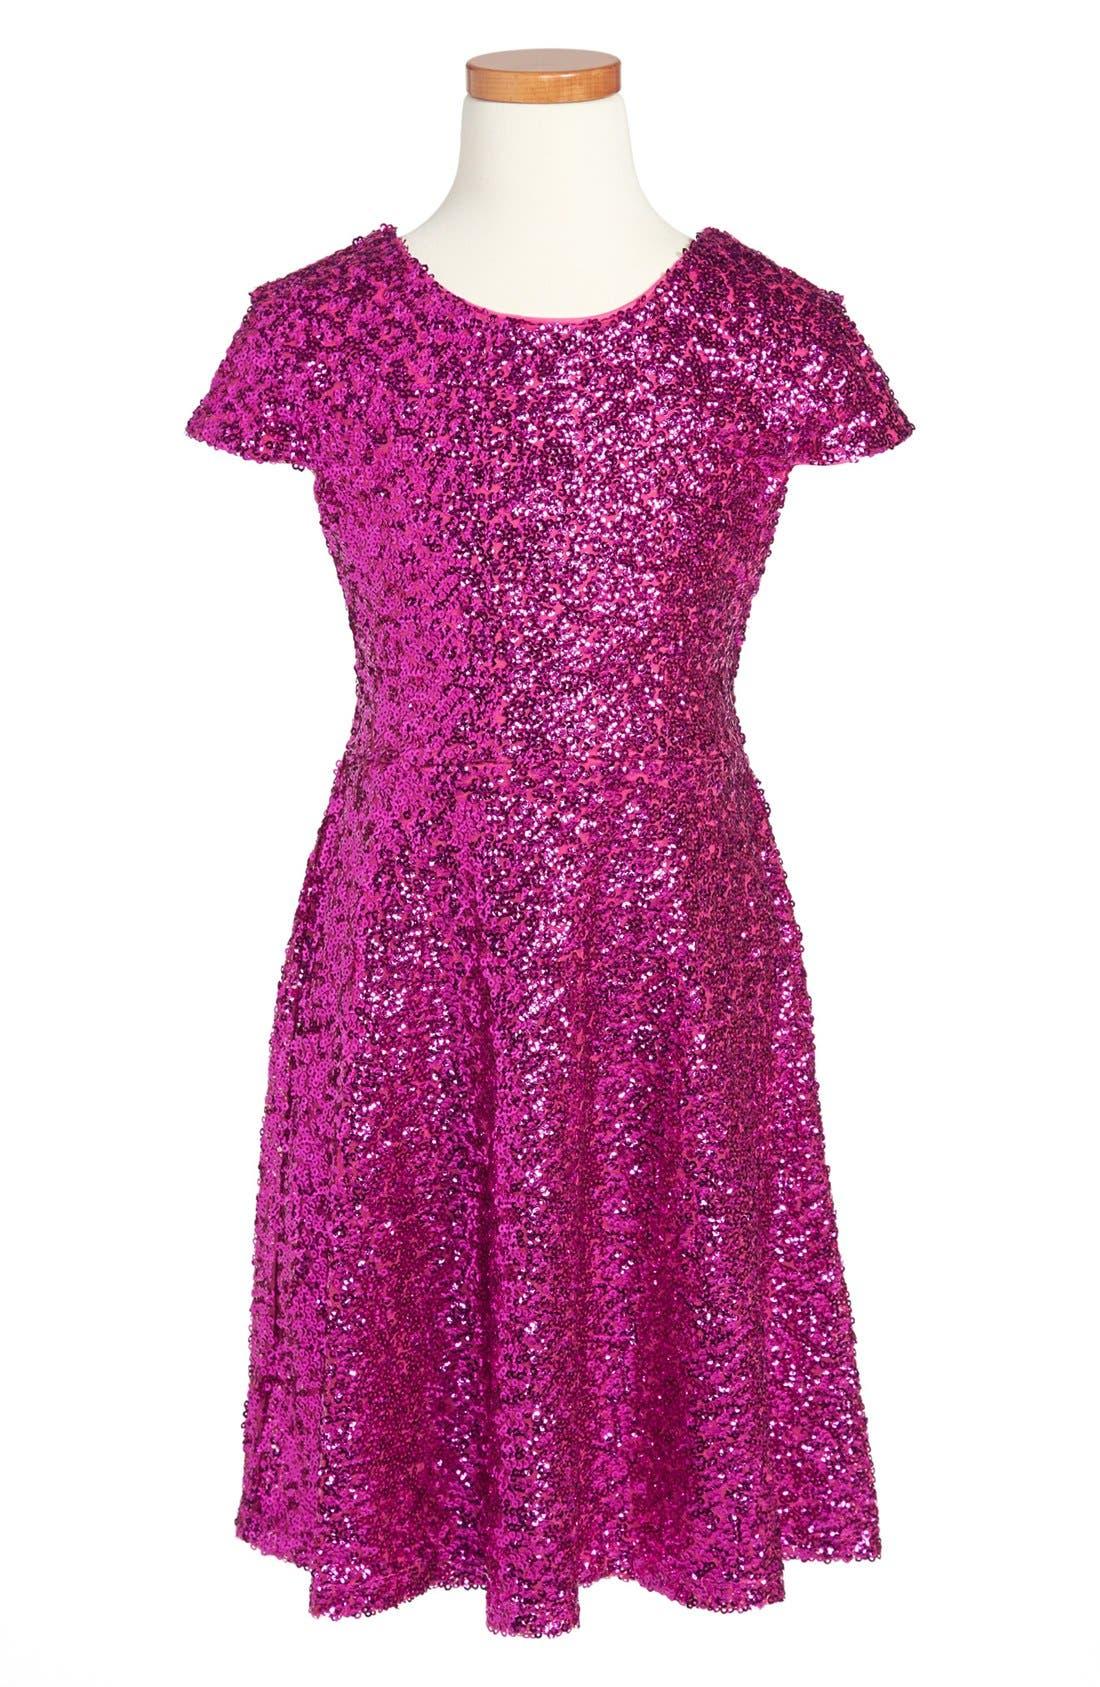 Alternate Image 1 Selected - Roxette Cap Sleeve Sequin Dress (Big Girls)